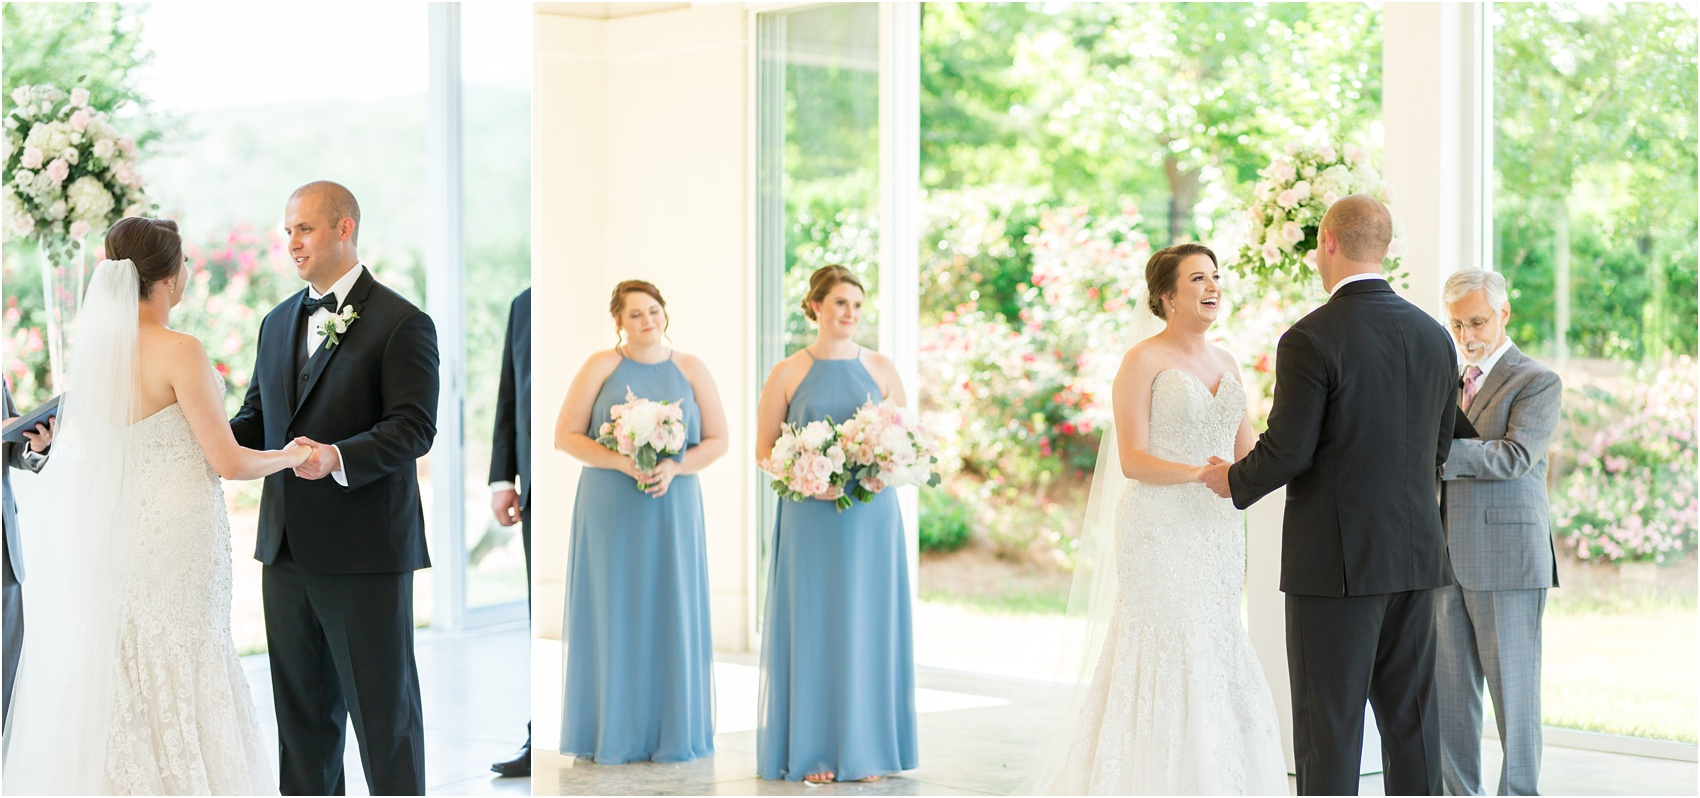 Savannah Eve Photography- Nutt Wedding- Blog-77.jpg